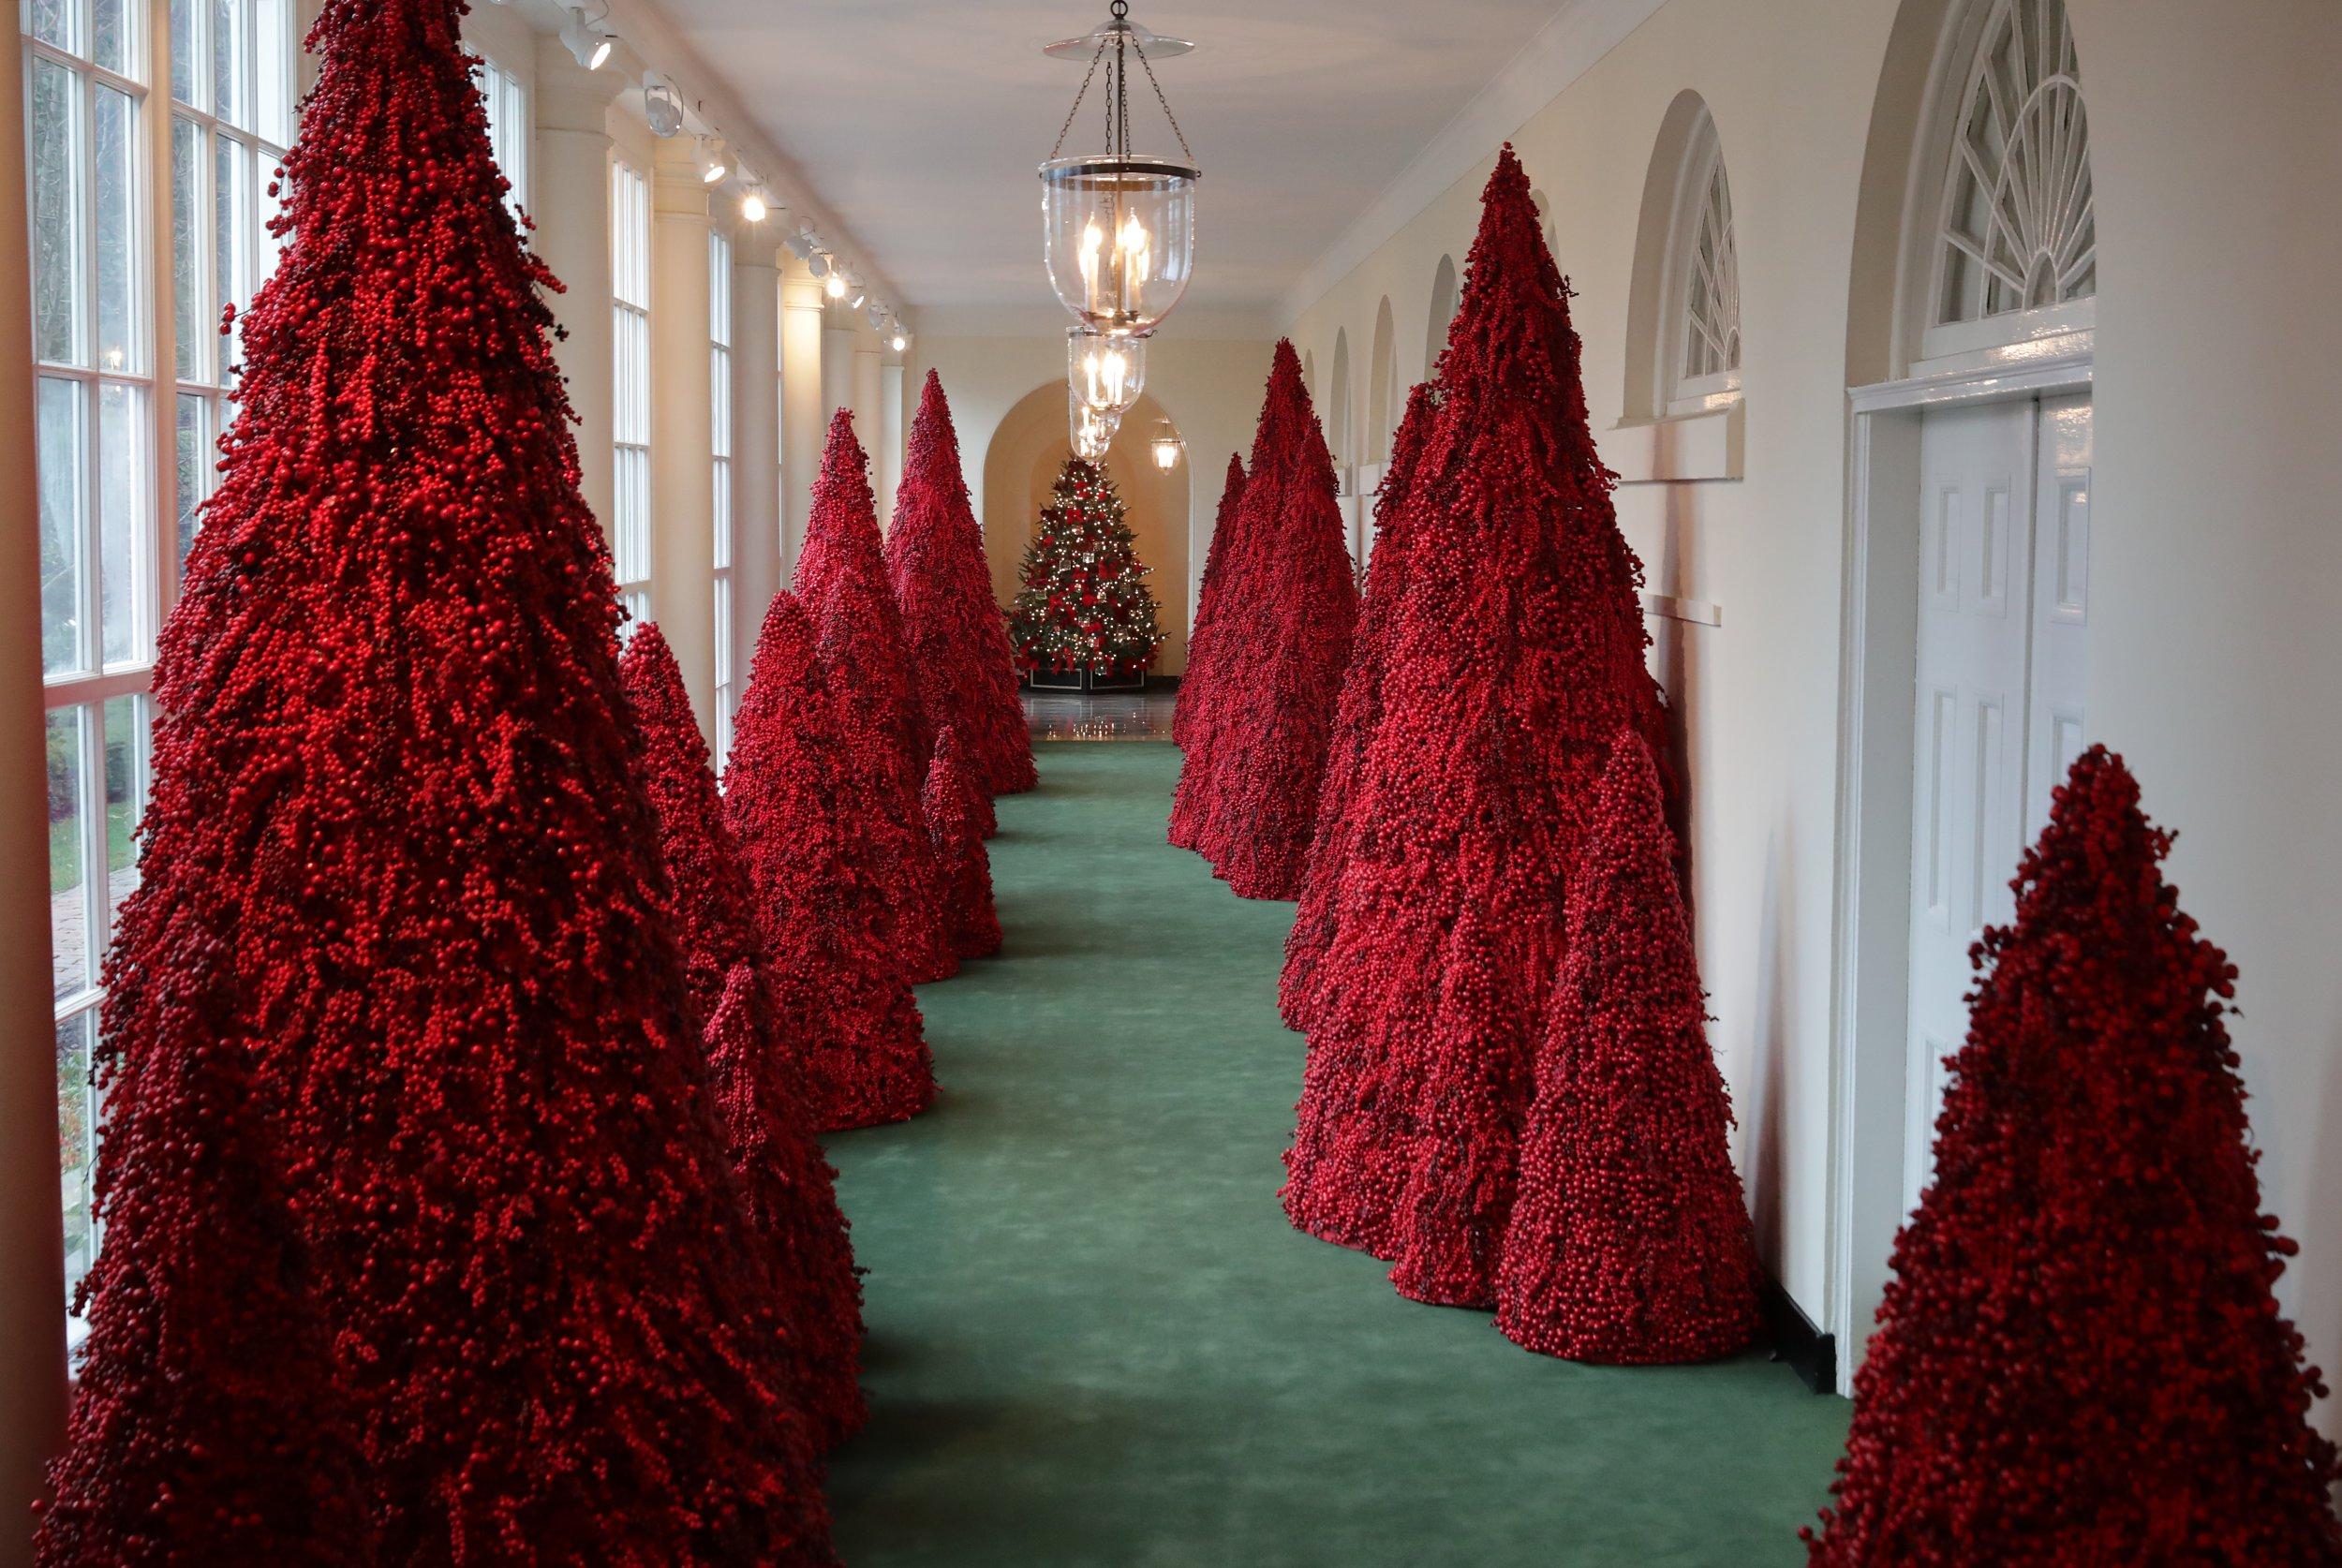 Criticism Of Melania Trump's Red 'Handmaid's Tale